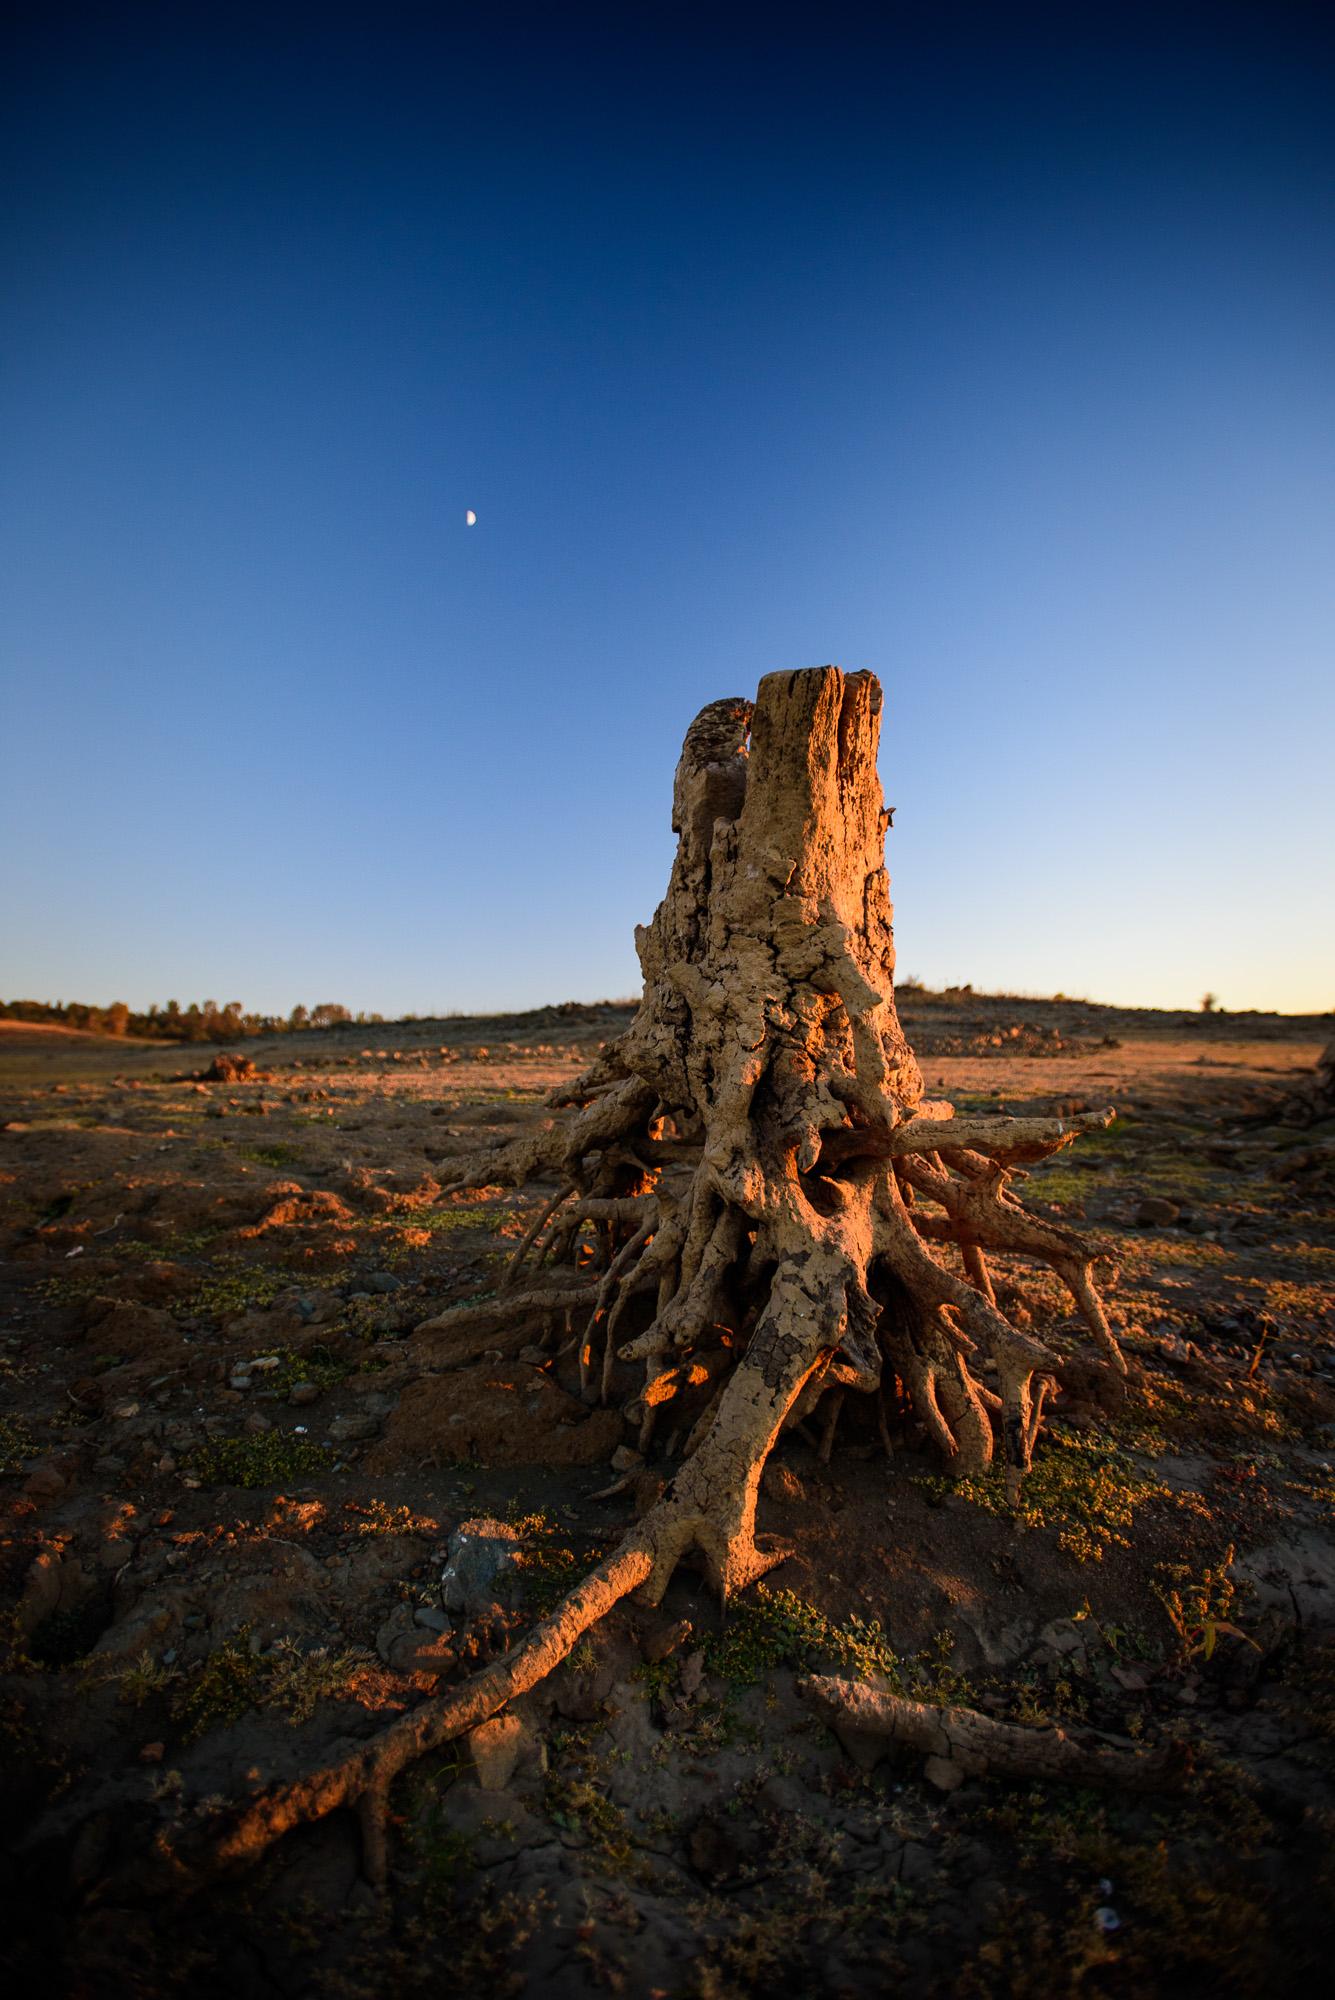 folsom_lake_tree_stump_brittany_app.jpg